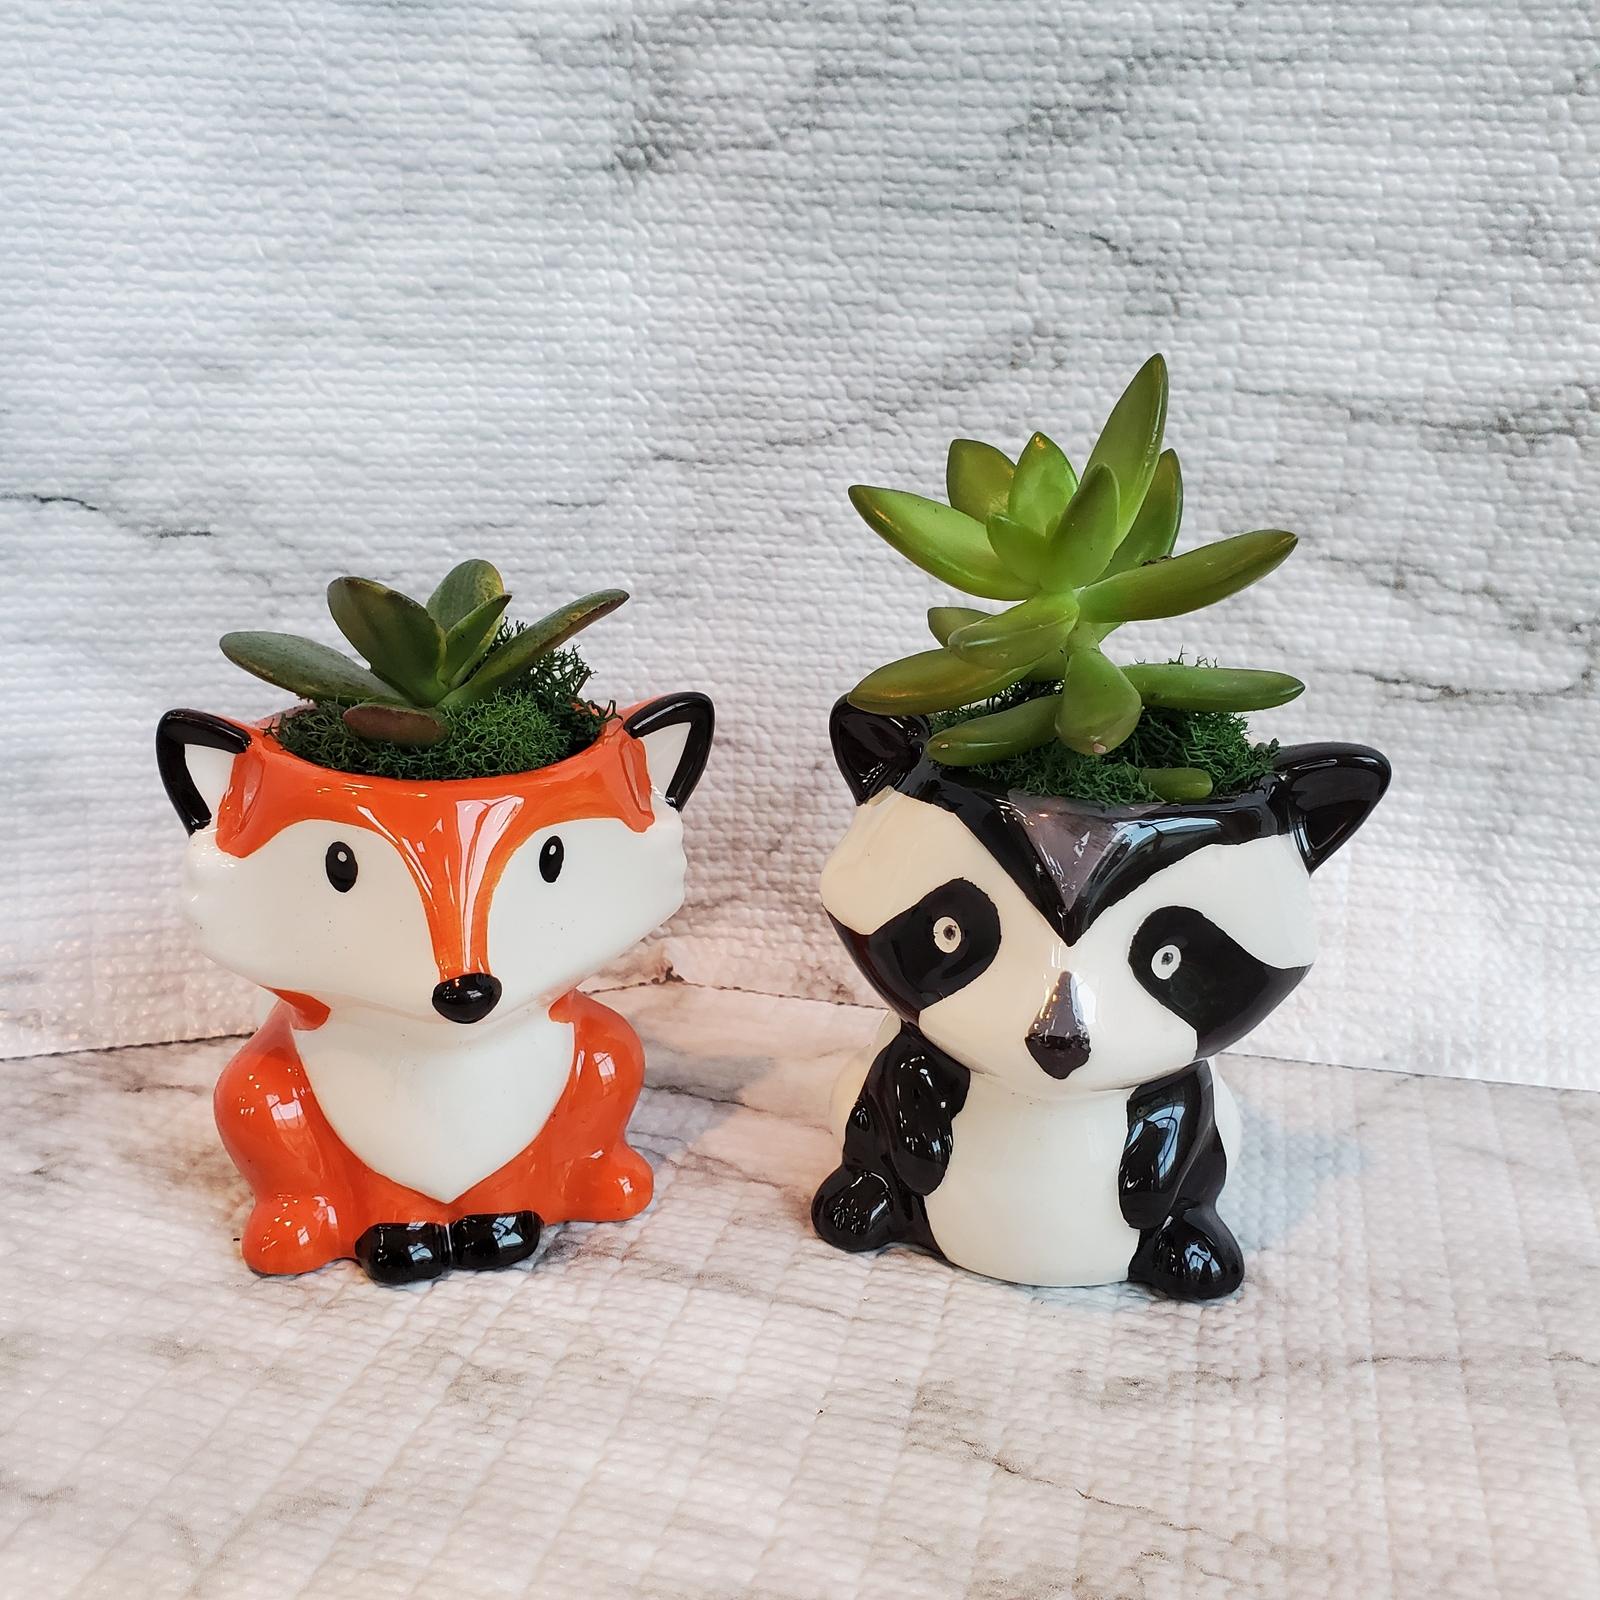 Foxraccoon succulents 1